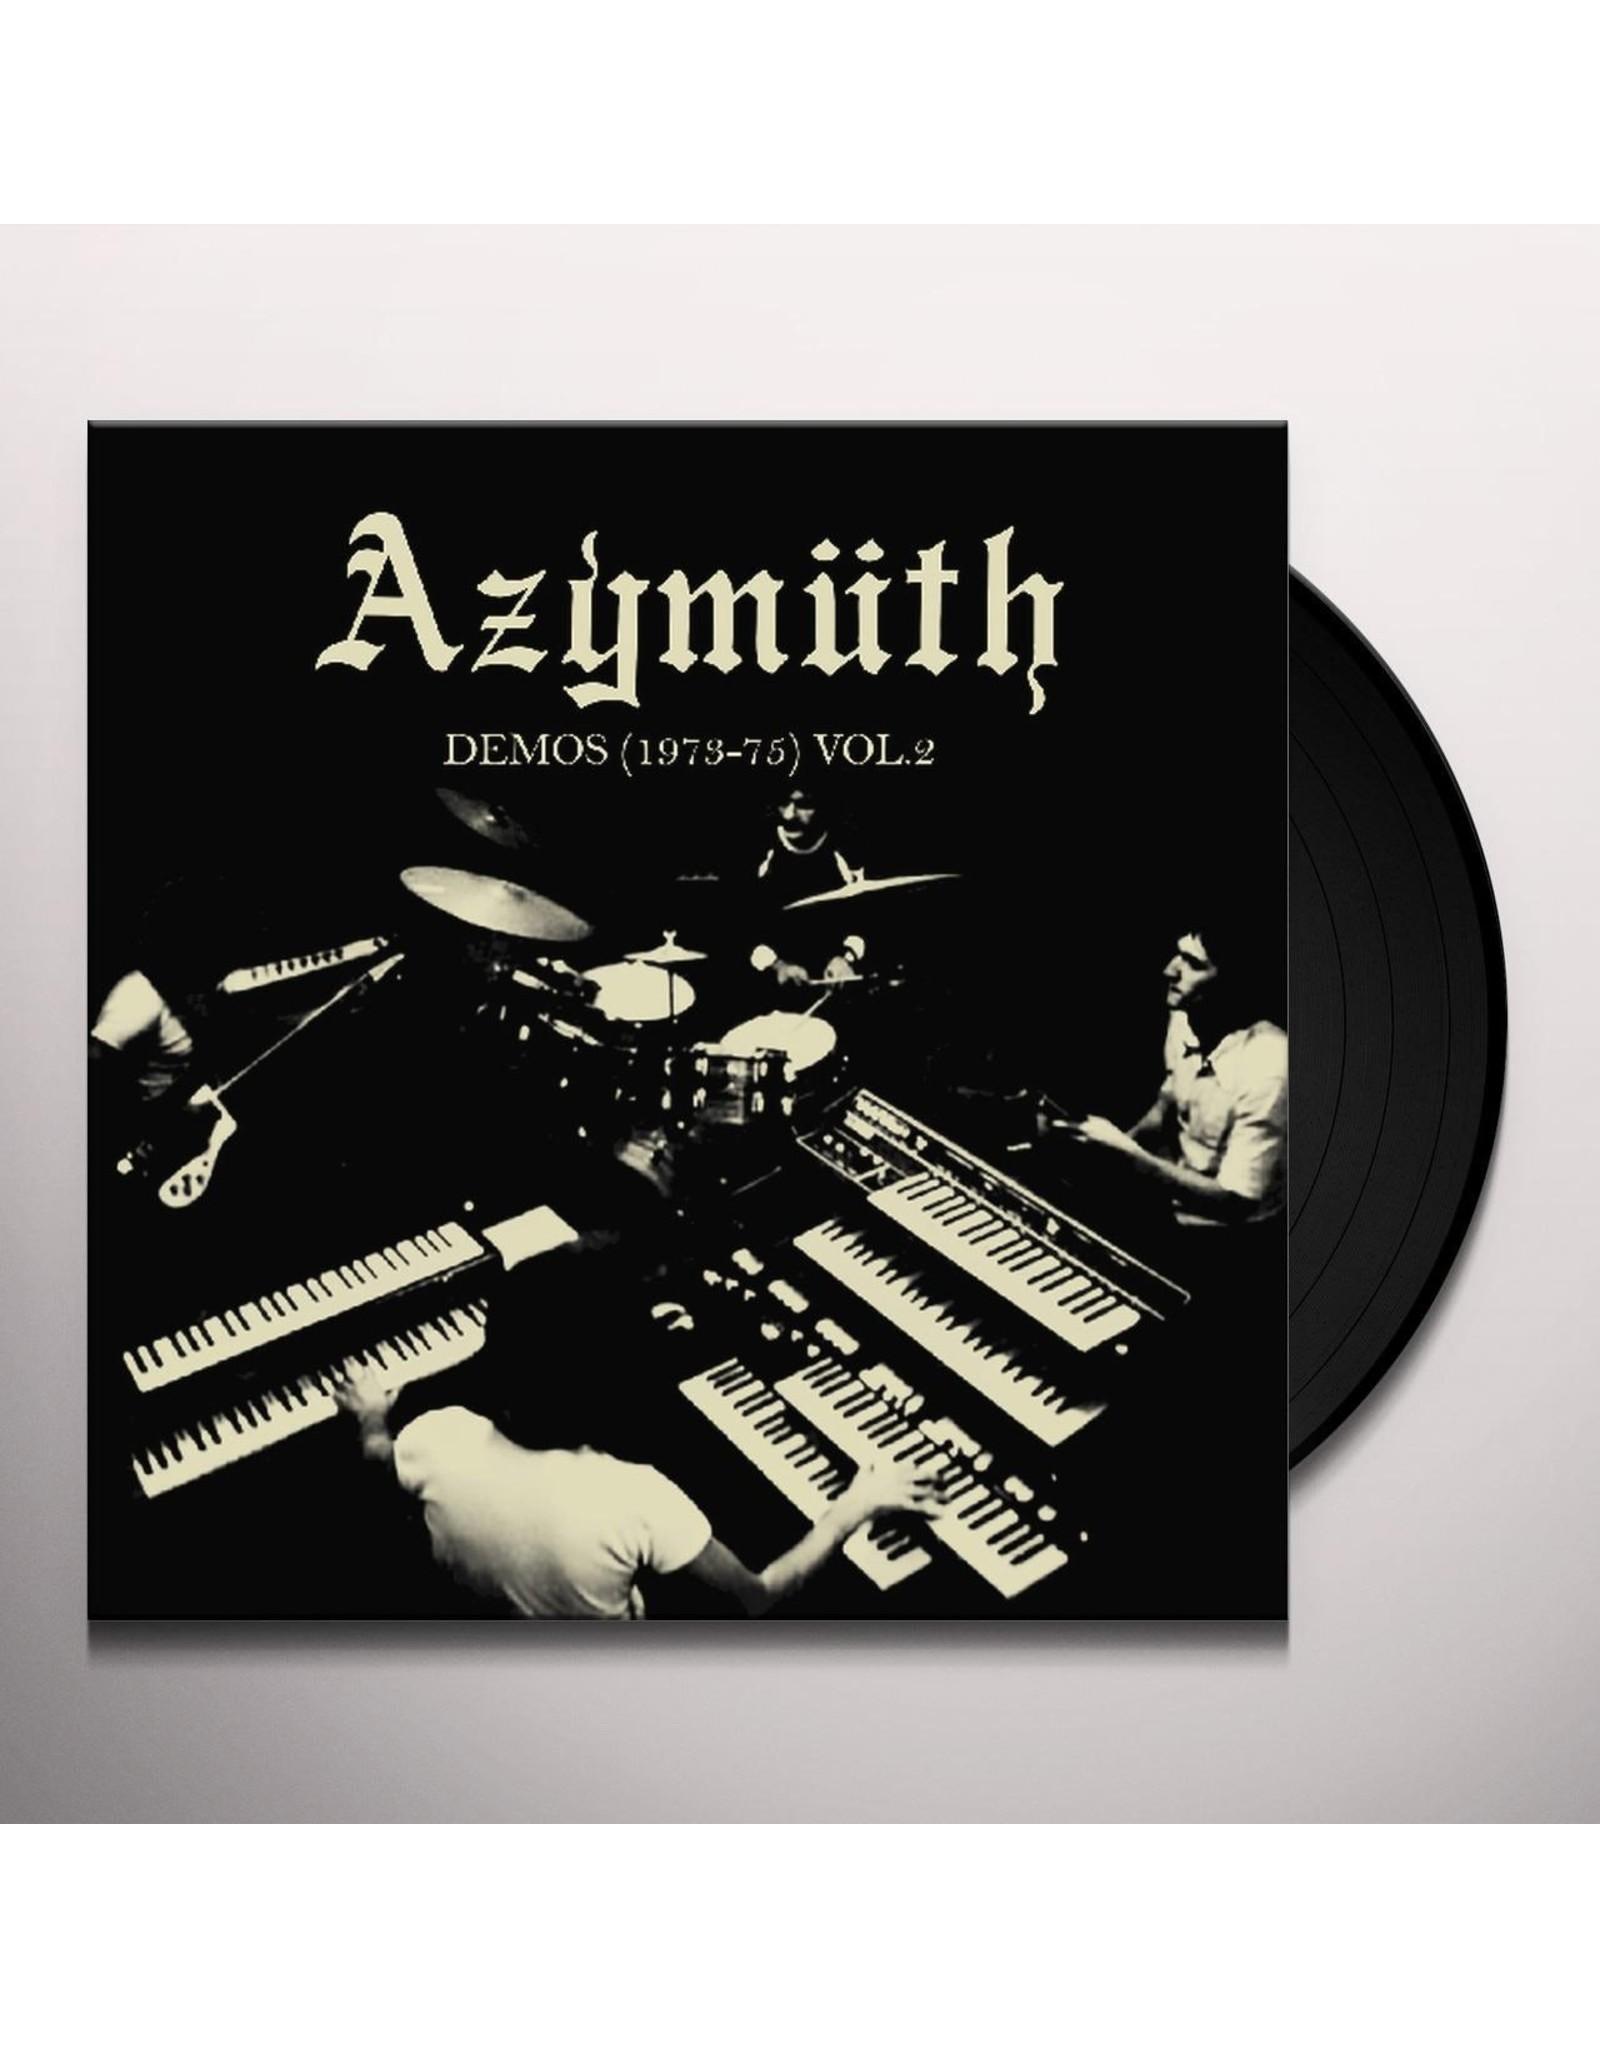 New Vinyl Azymuth - Demos (1973-75) Vol 2 LP